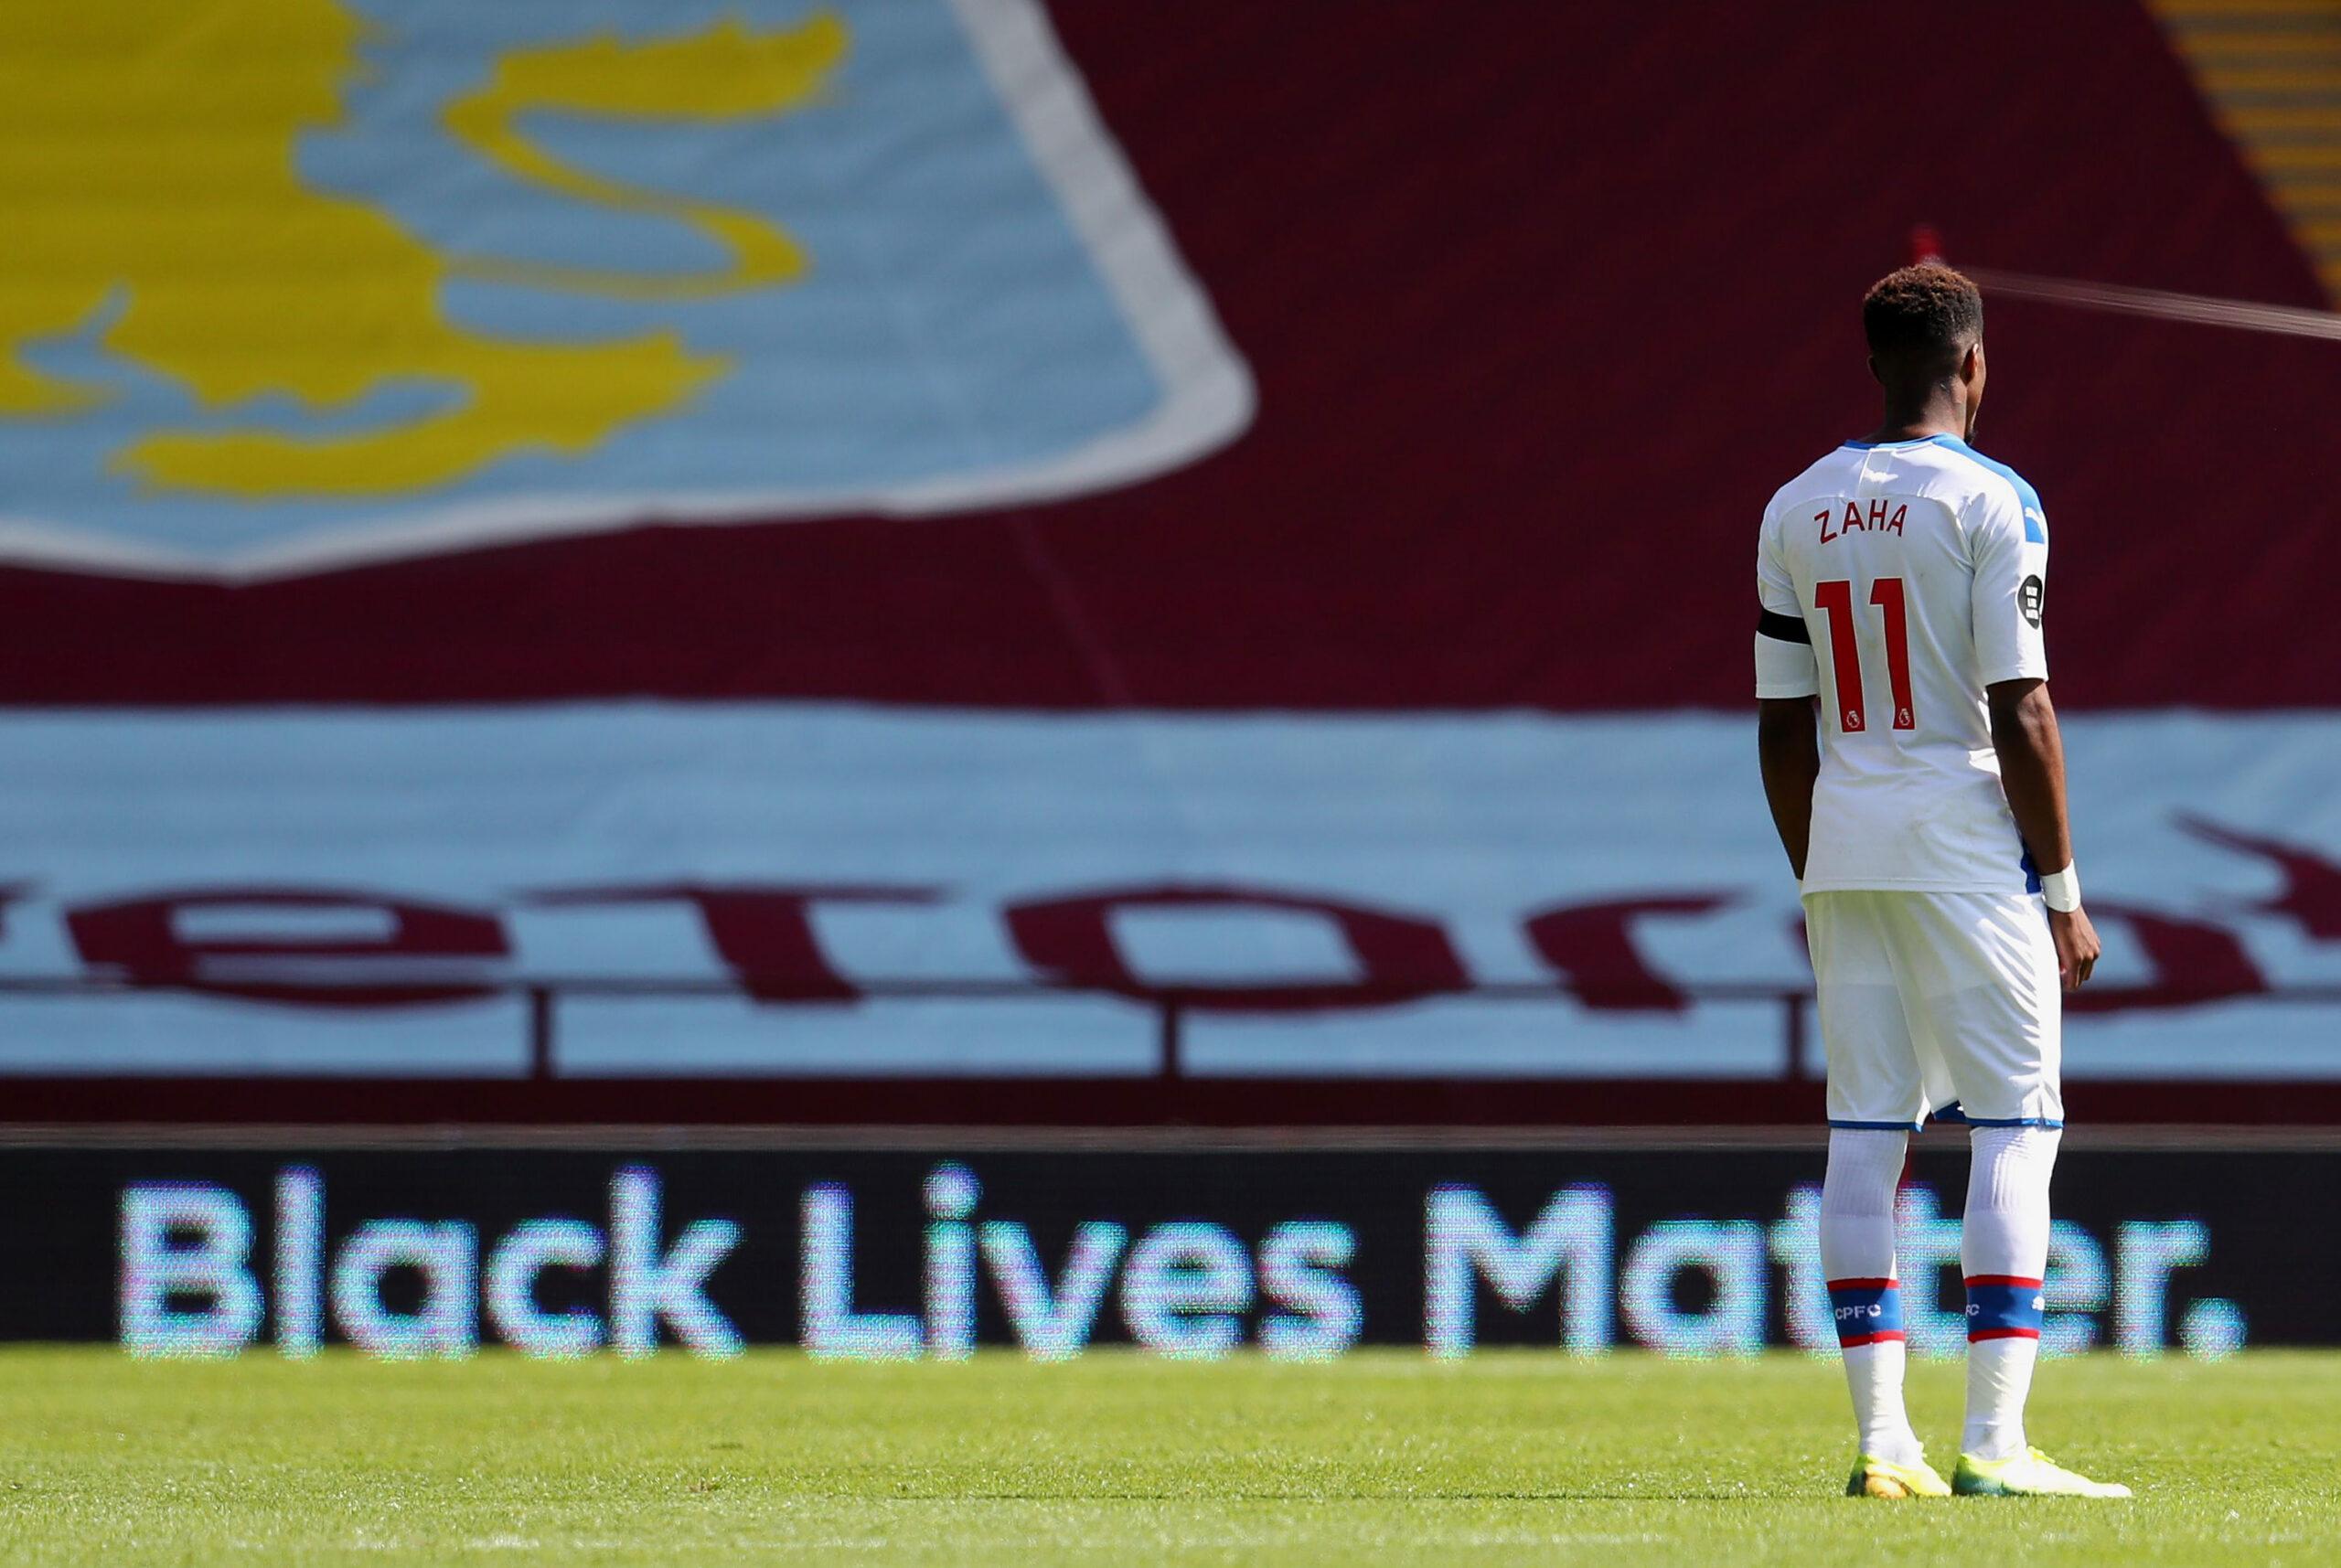 Así juega Wilfried Zaha, un fichaje real para el Atleti